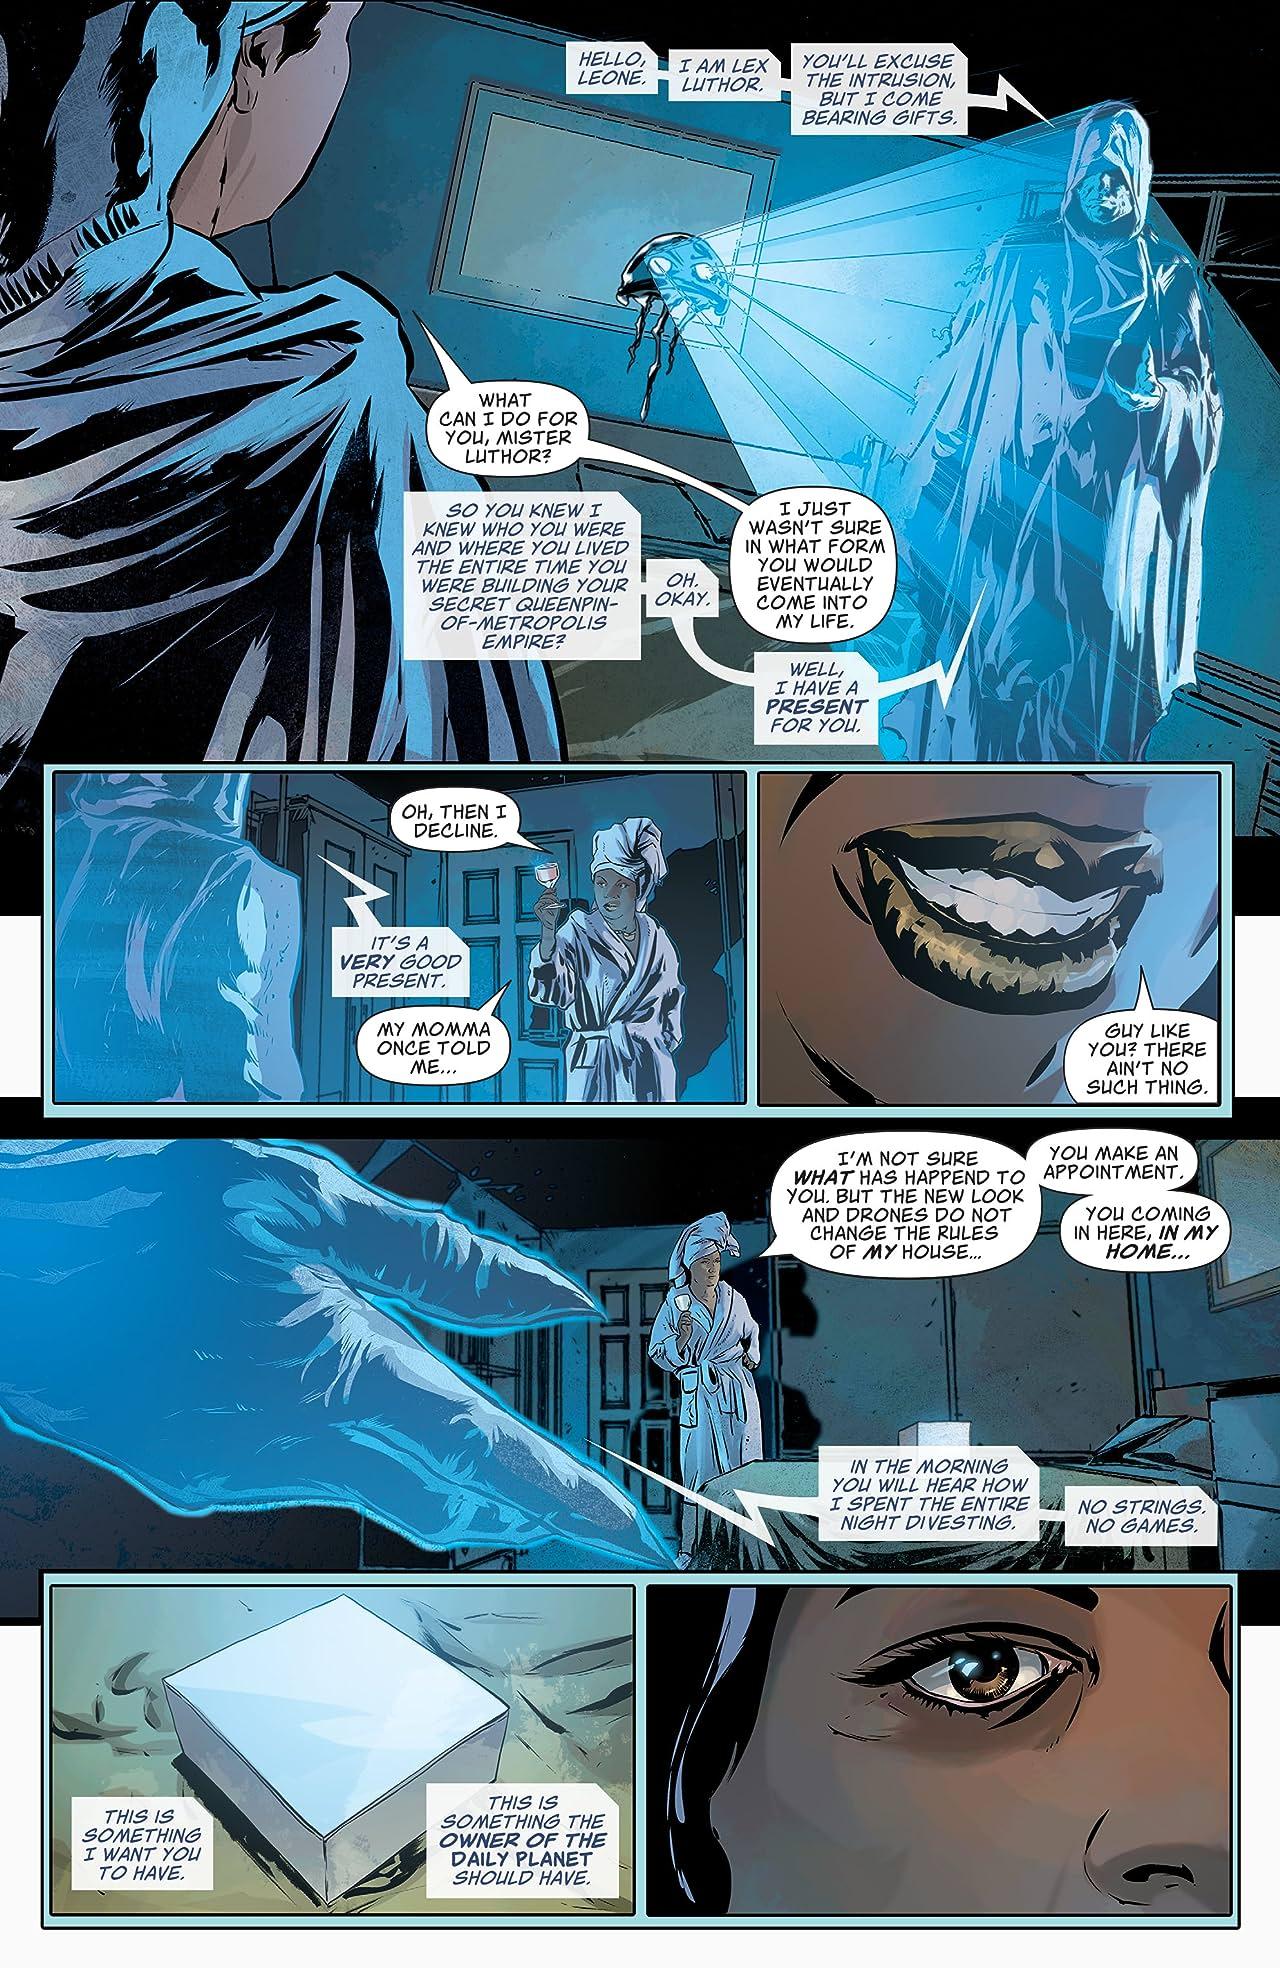 Action Comics (2016-) #1013